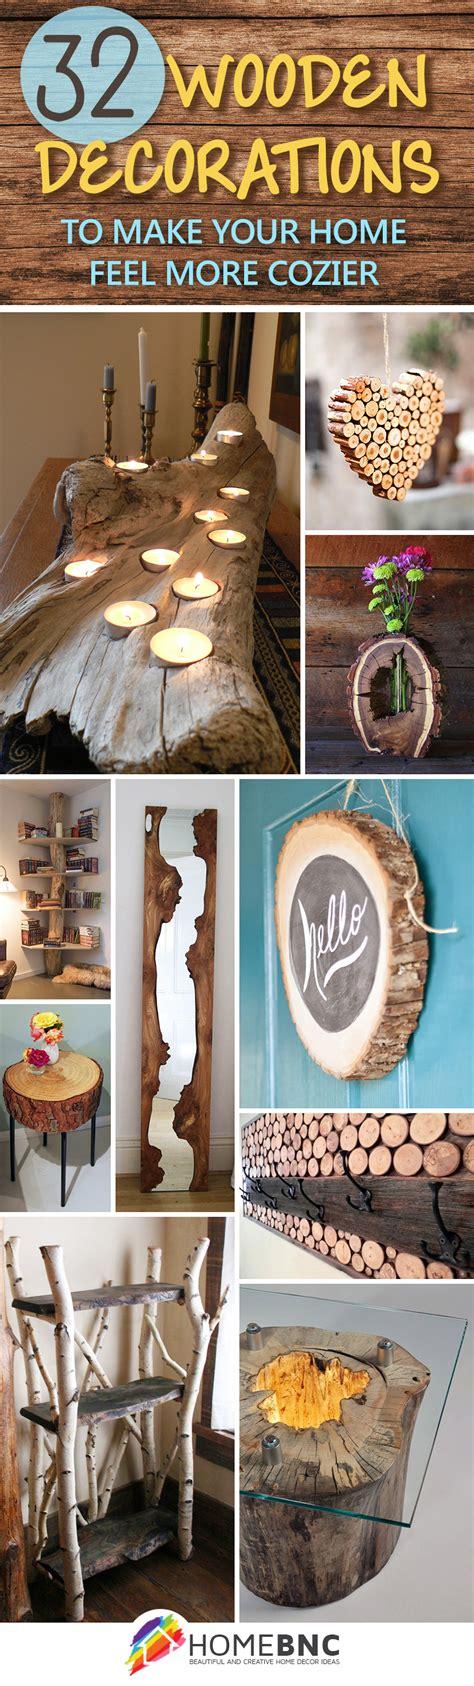 rustic home decor ideas pinterest rustic primitive country decorating ideas pinterest home